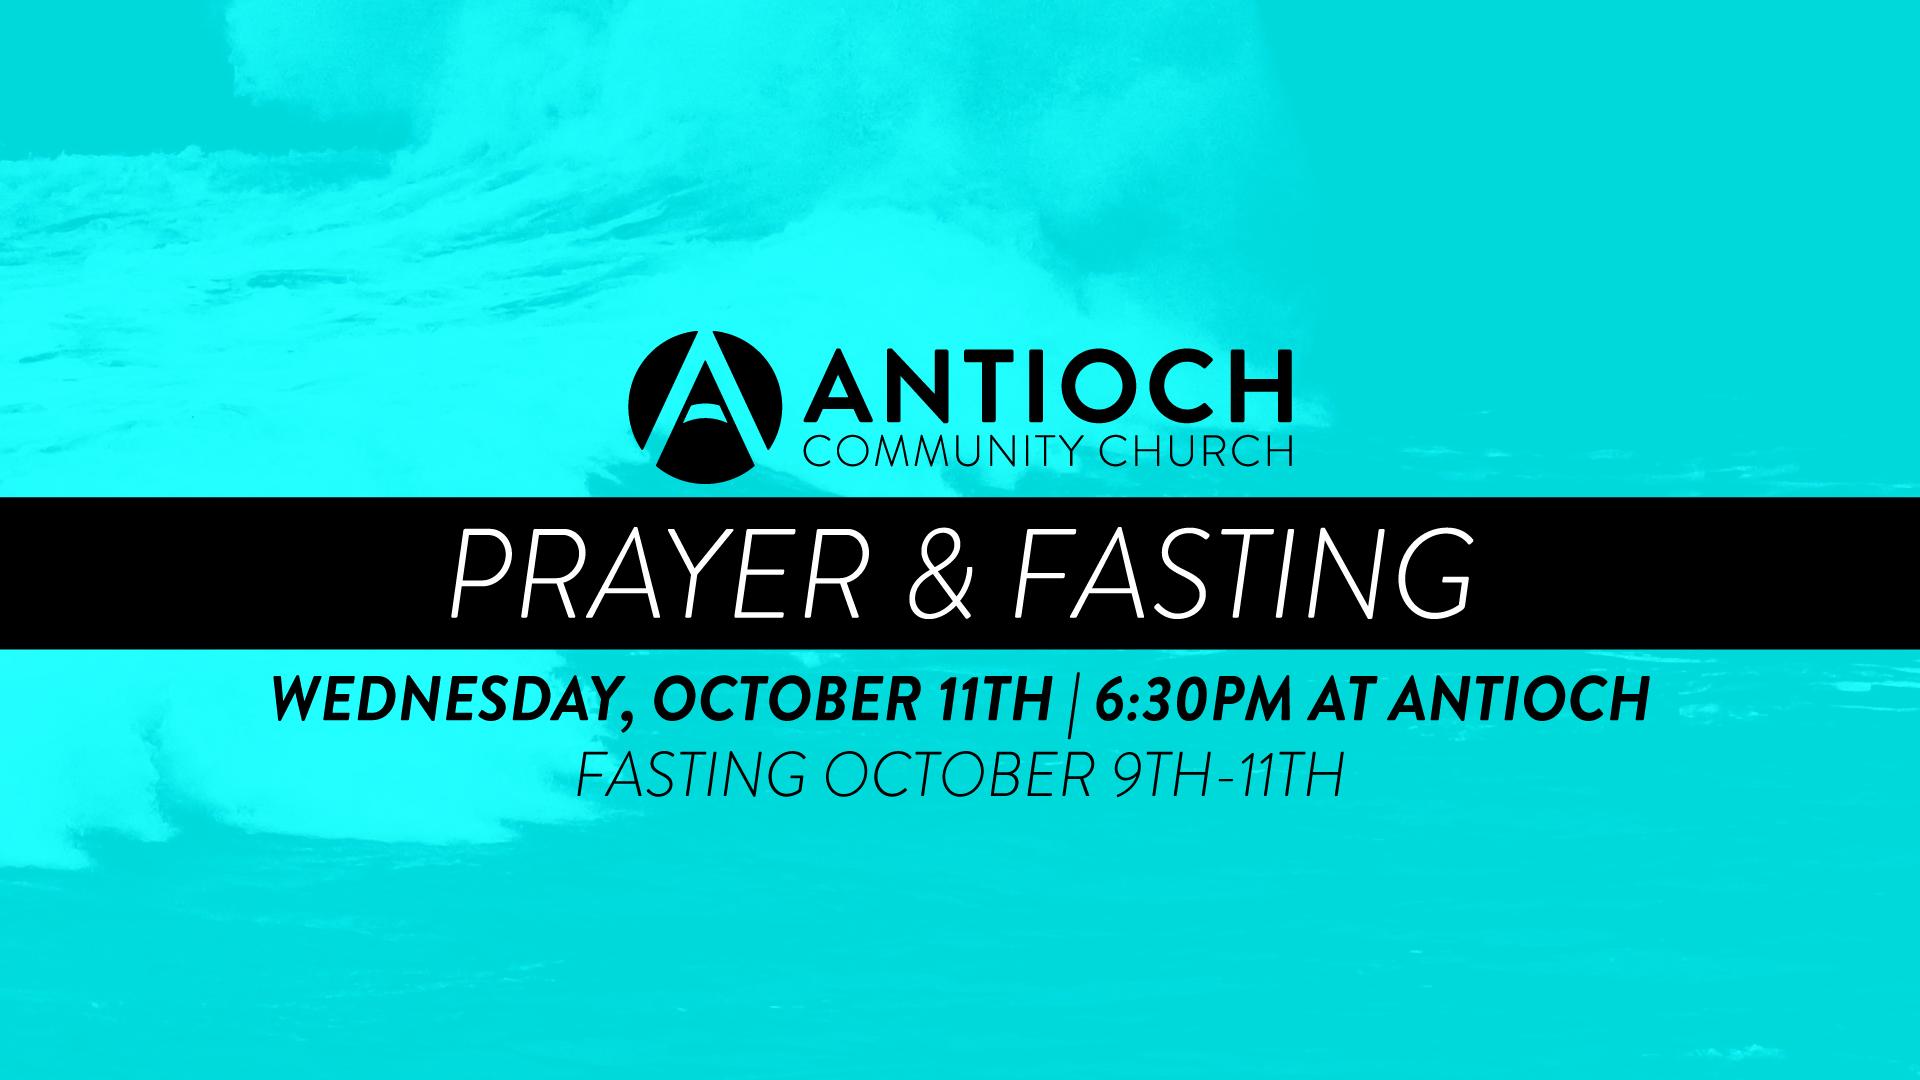 Prayer-&-Fasting-10.11 (1).png